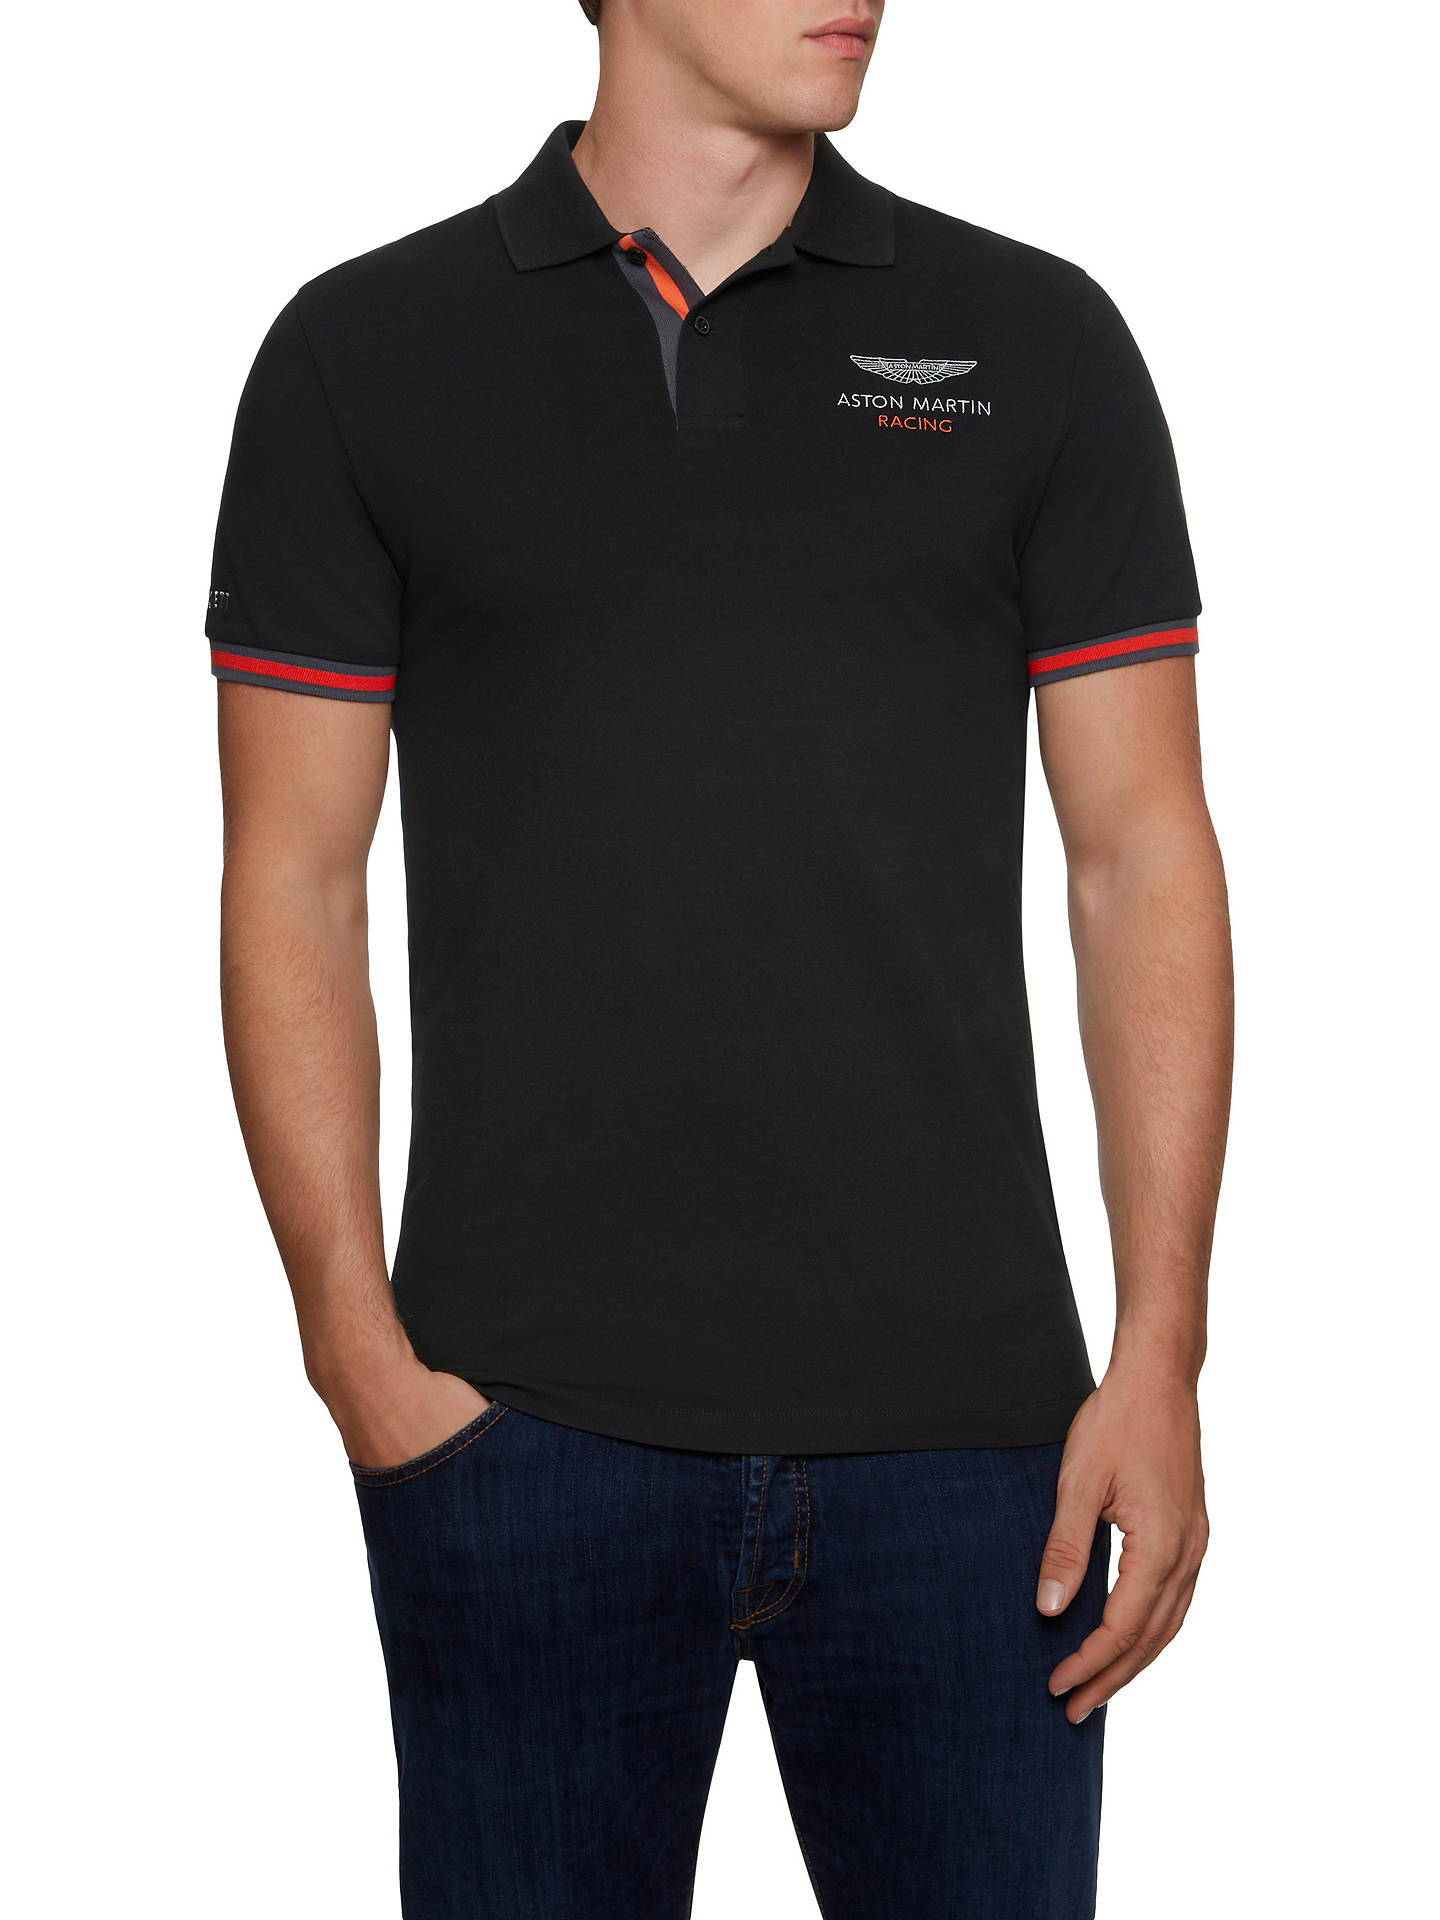 ca9fcbc696f Buy Hackett London Aston Martin Racing Polo Shirt, Black, XL Online at  johnlewis.